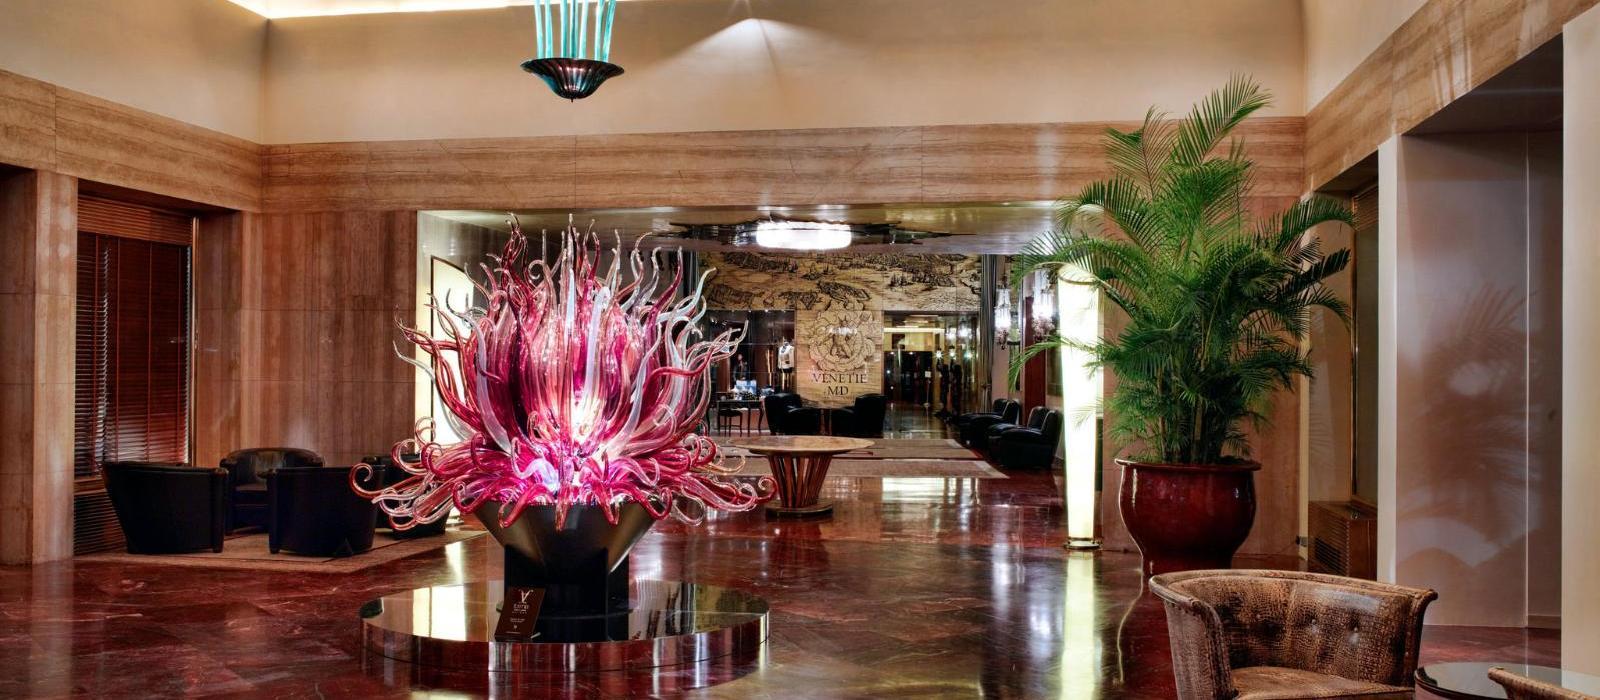 博尔宫酒店(Bauer Palazzo) 大堂图片  www.lhw.cn